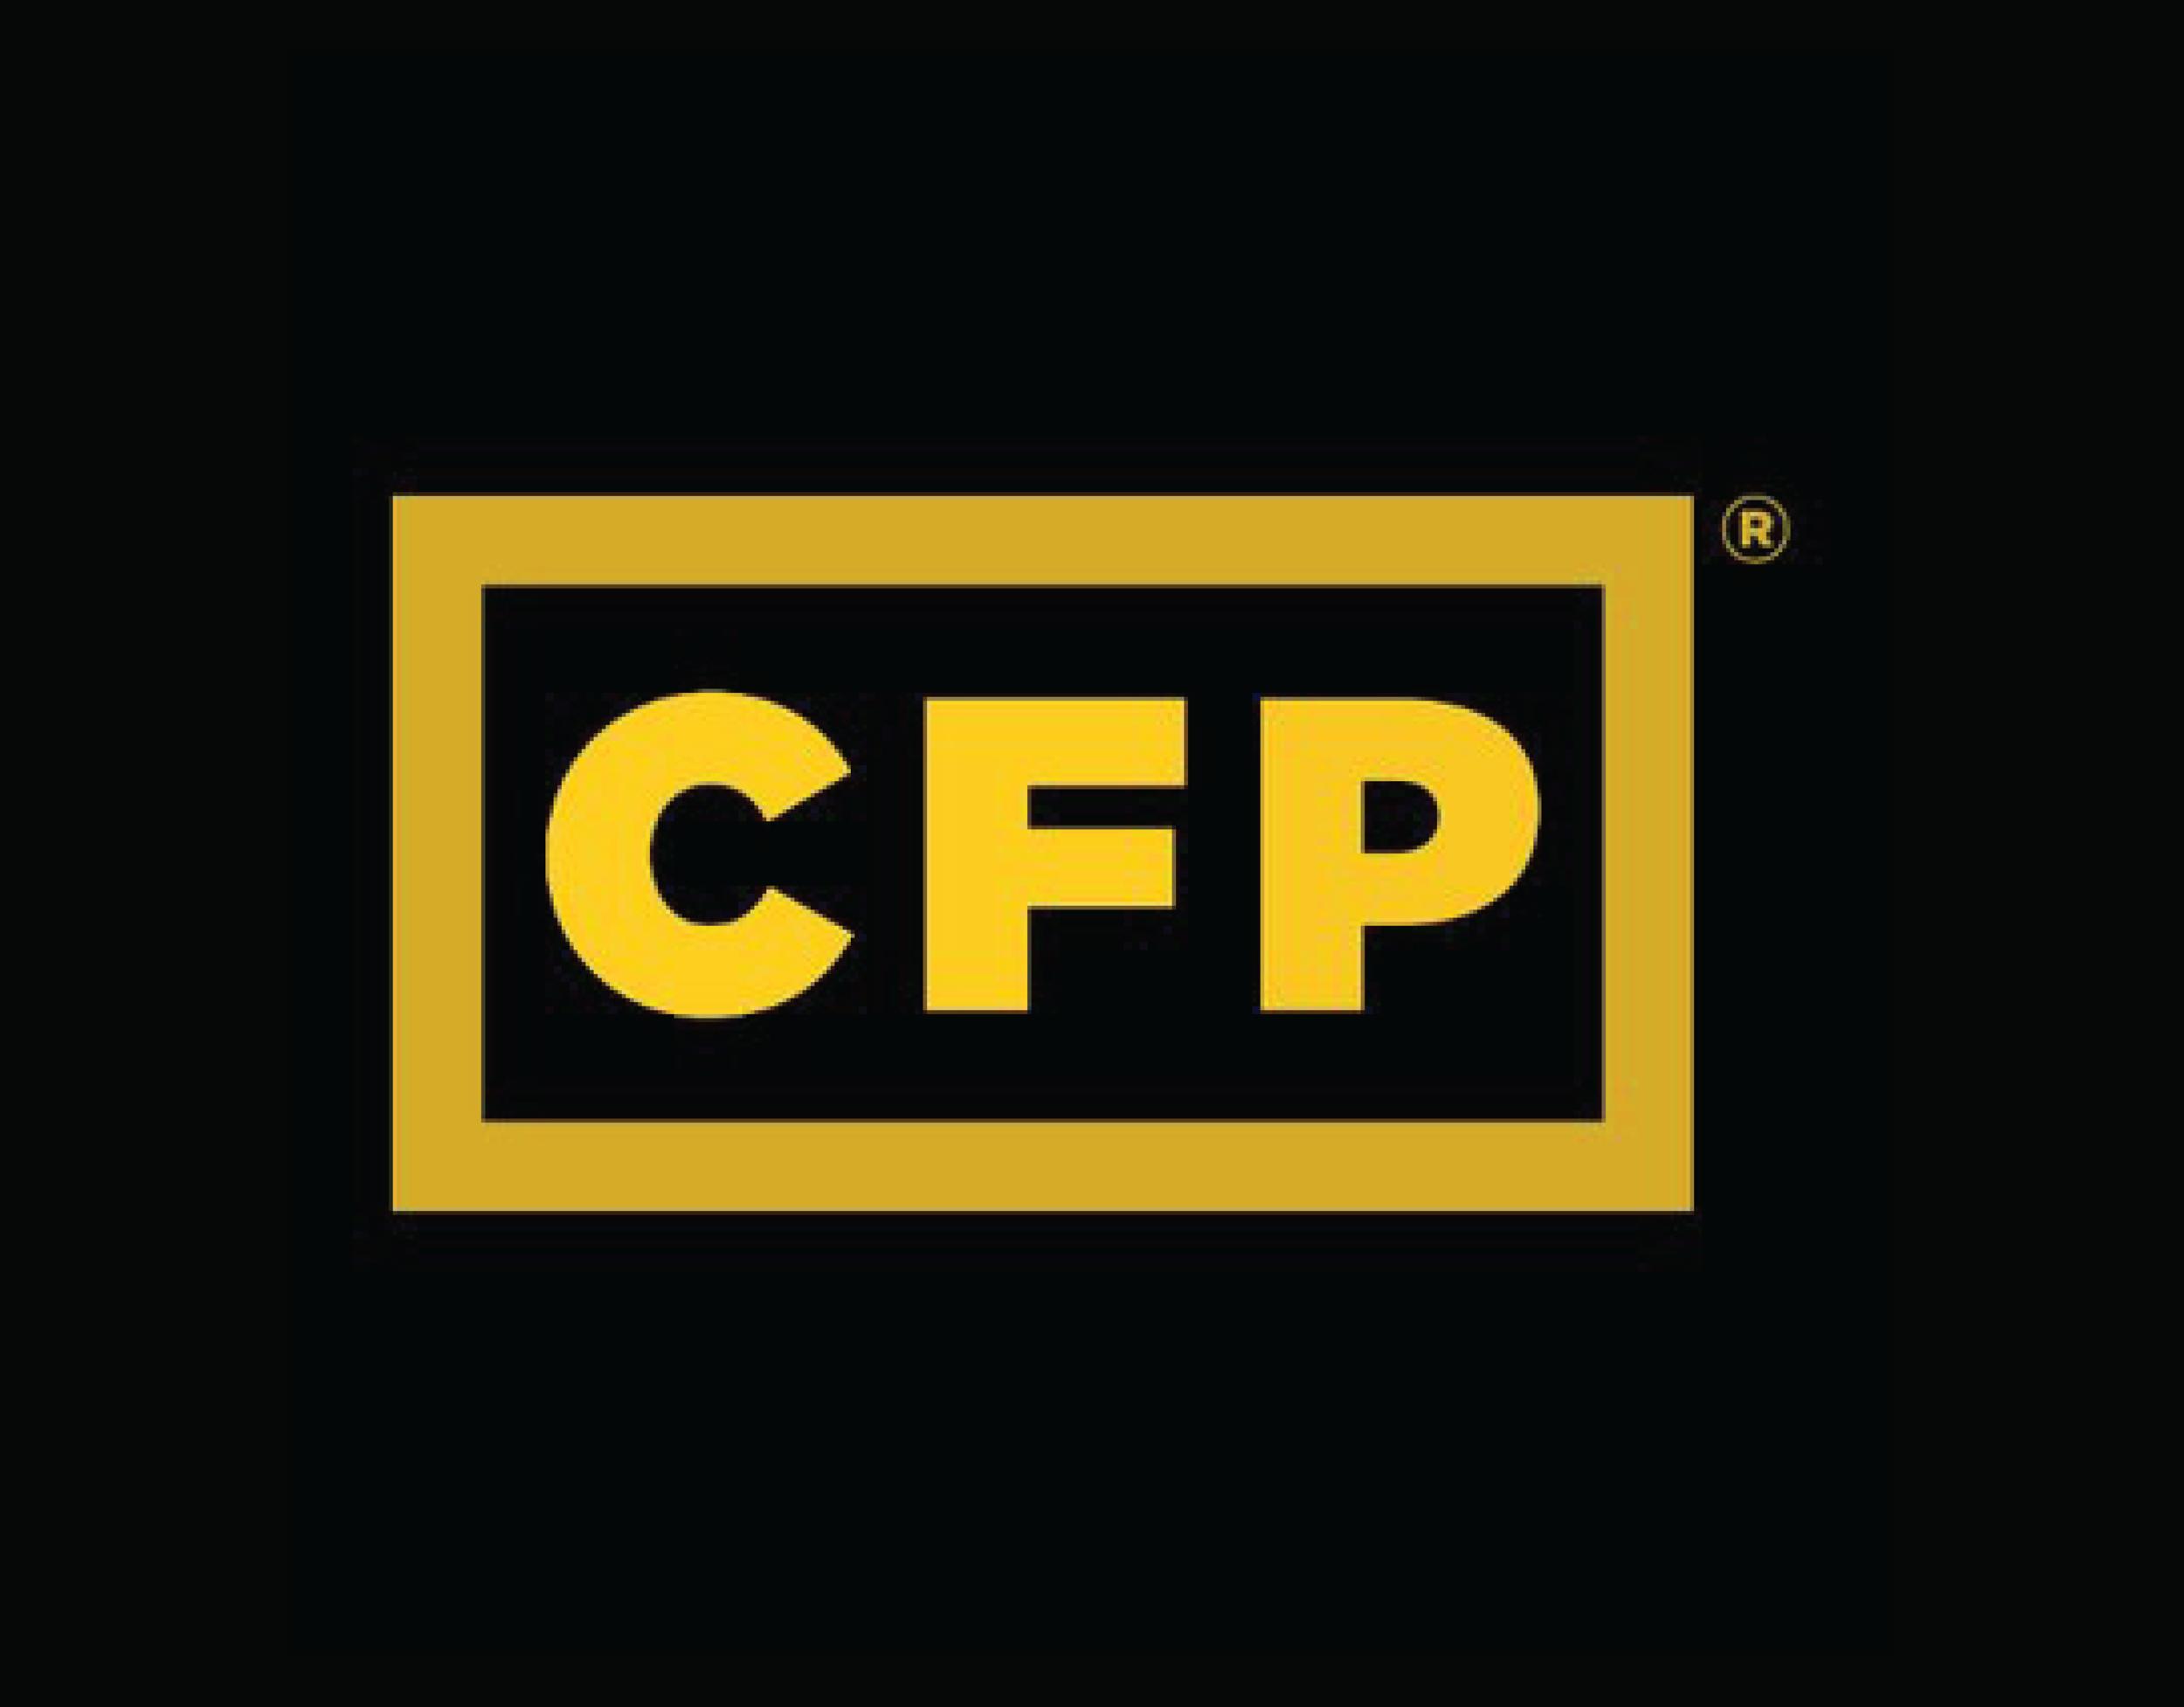 cfp-01-01.png